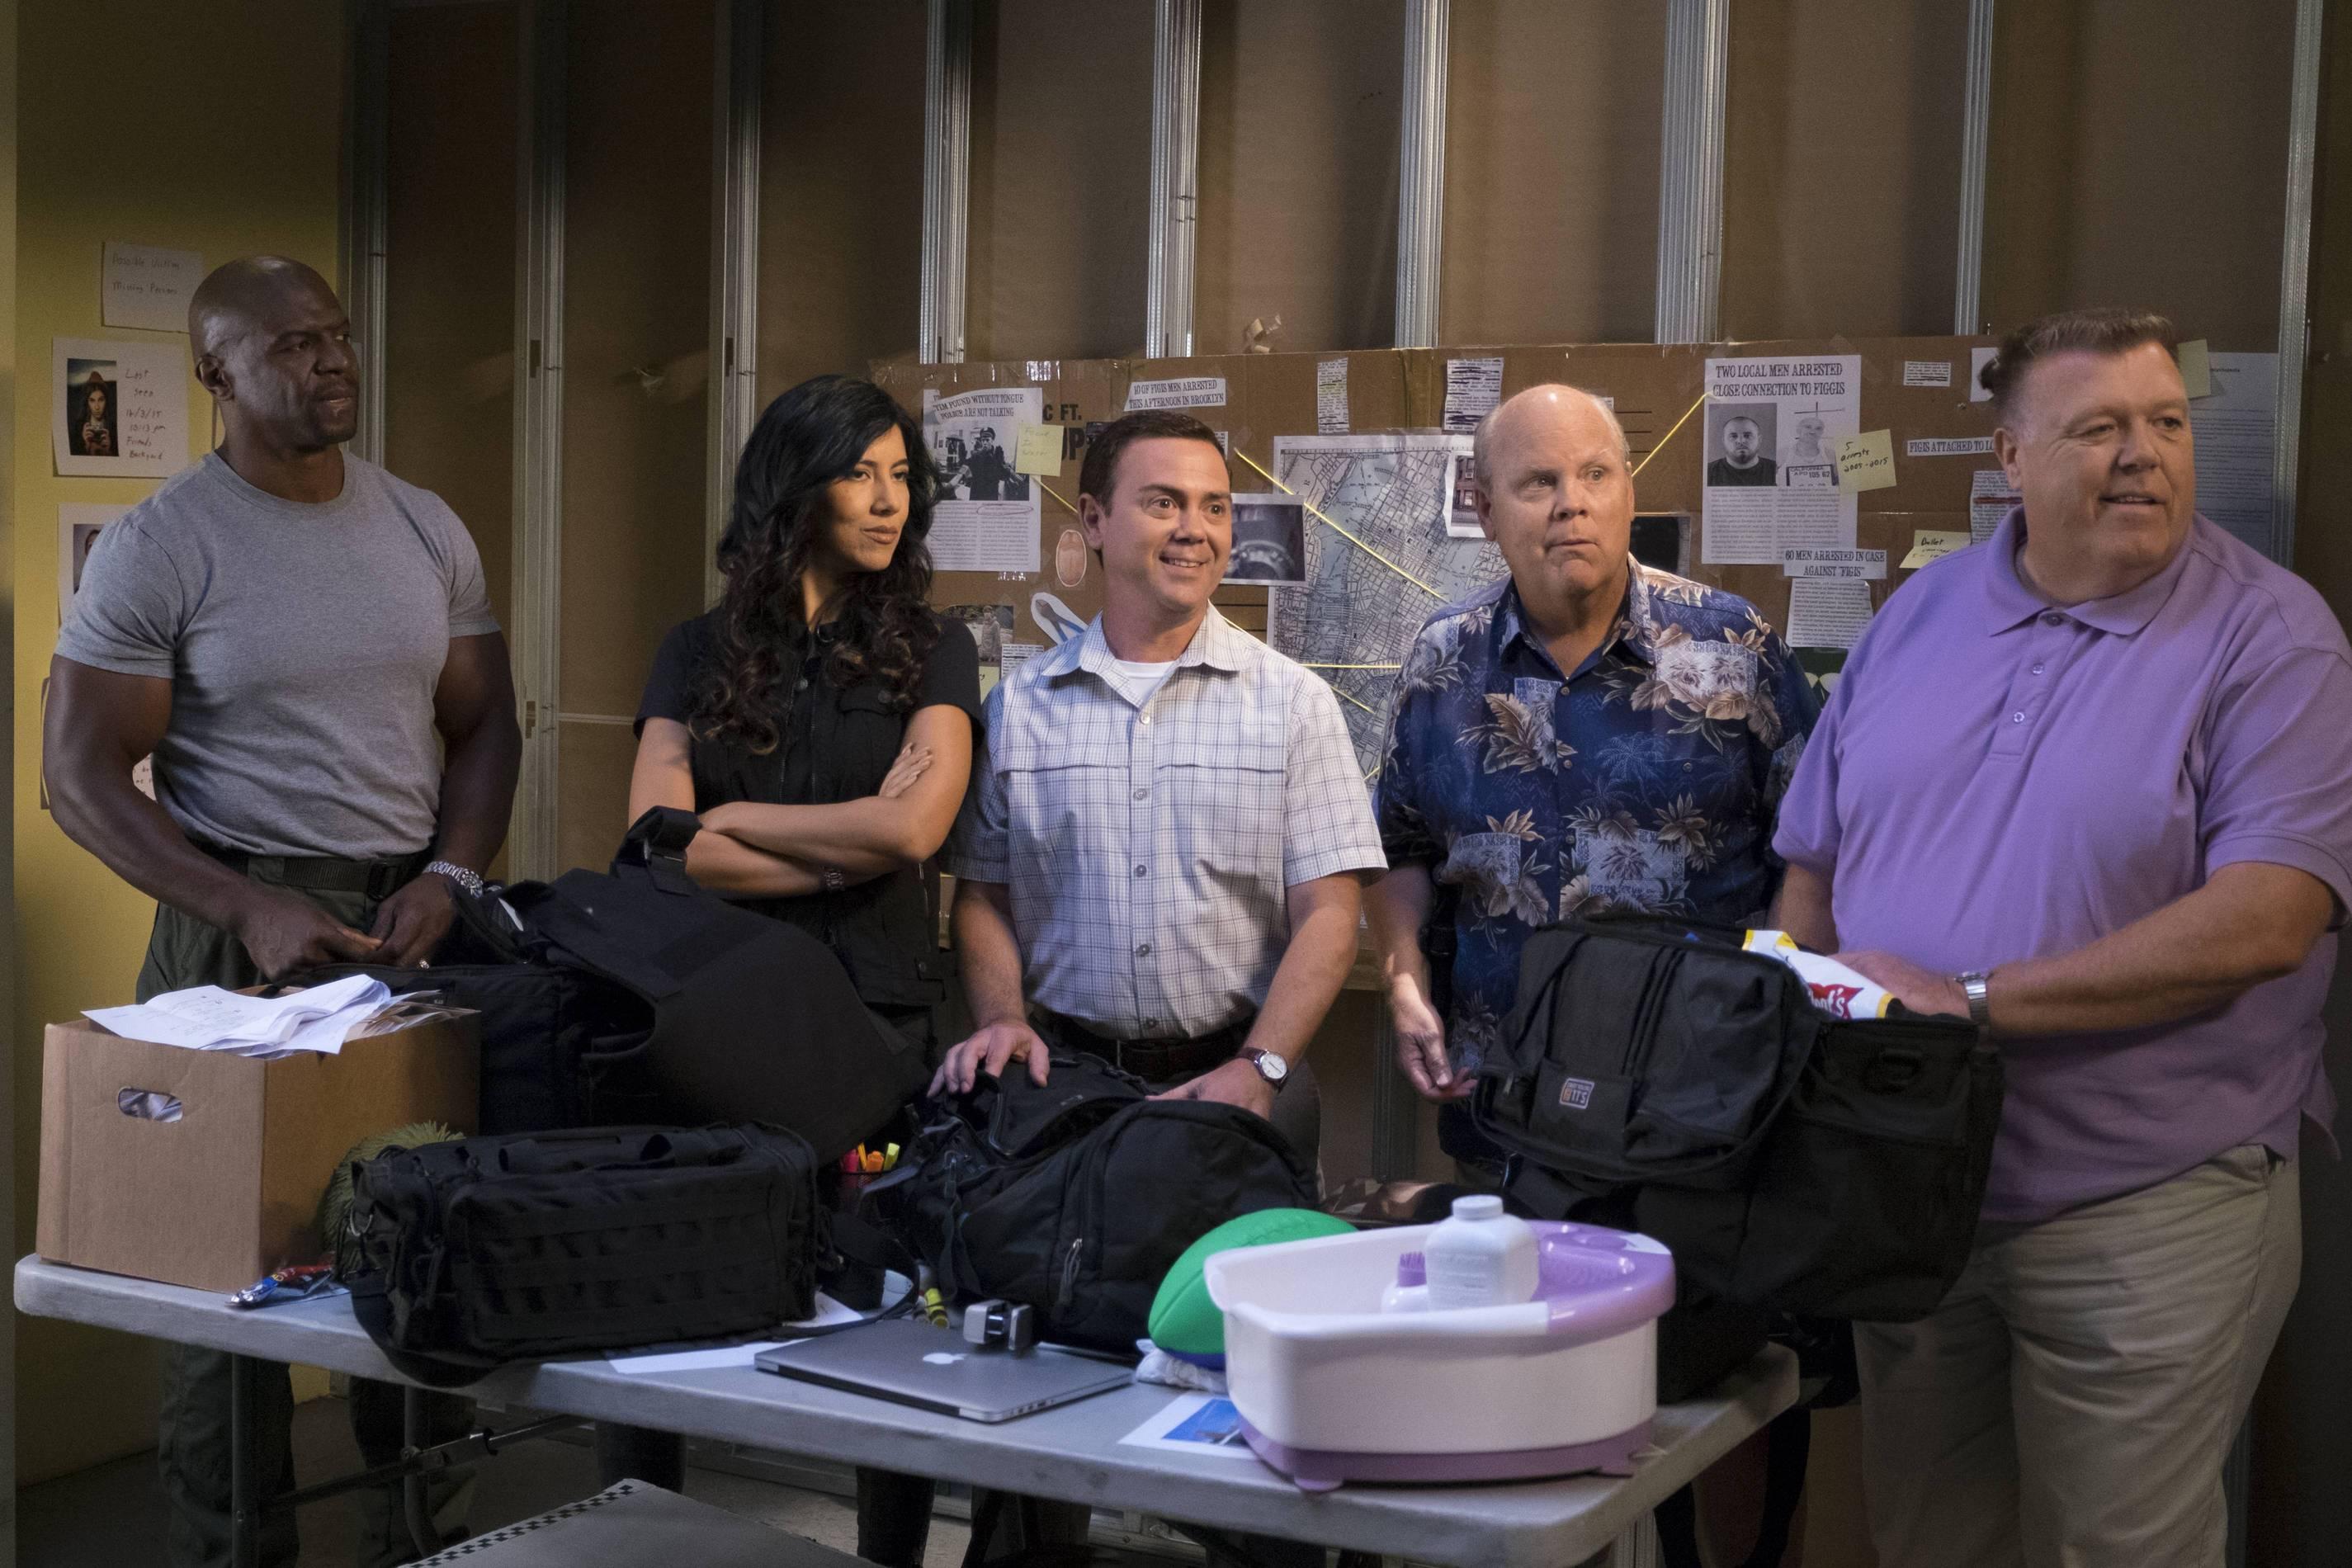 Brooklyn Nine-Nine: Coral Palms, Part 3 | Season 4 | Episode 3